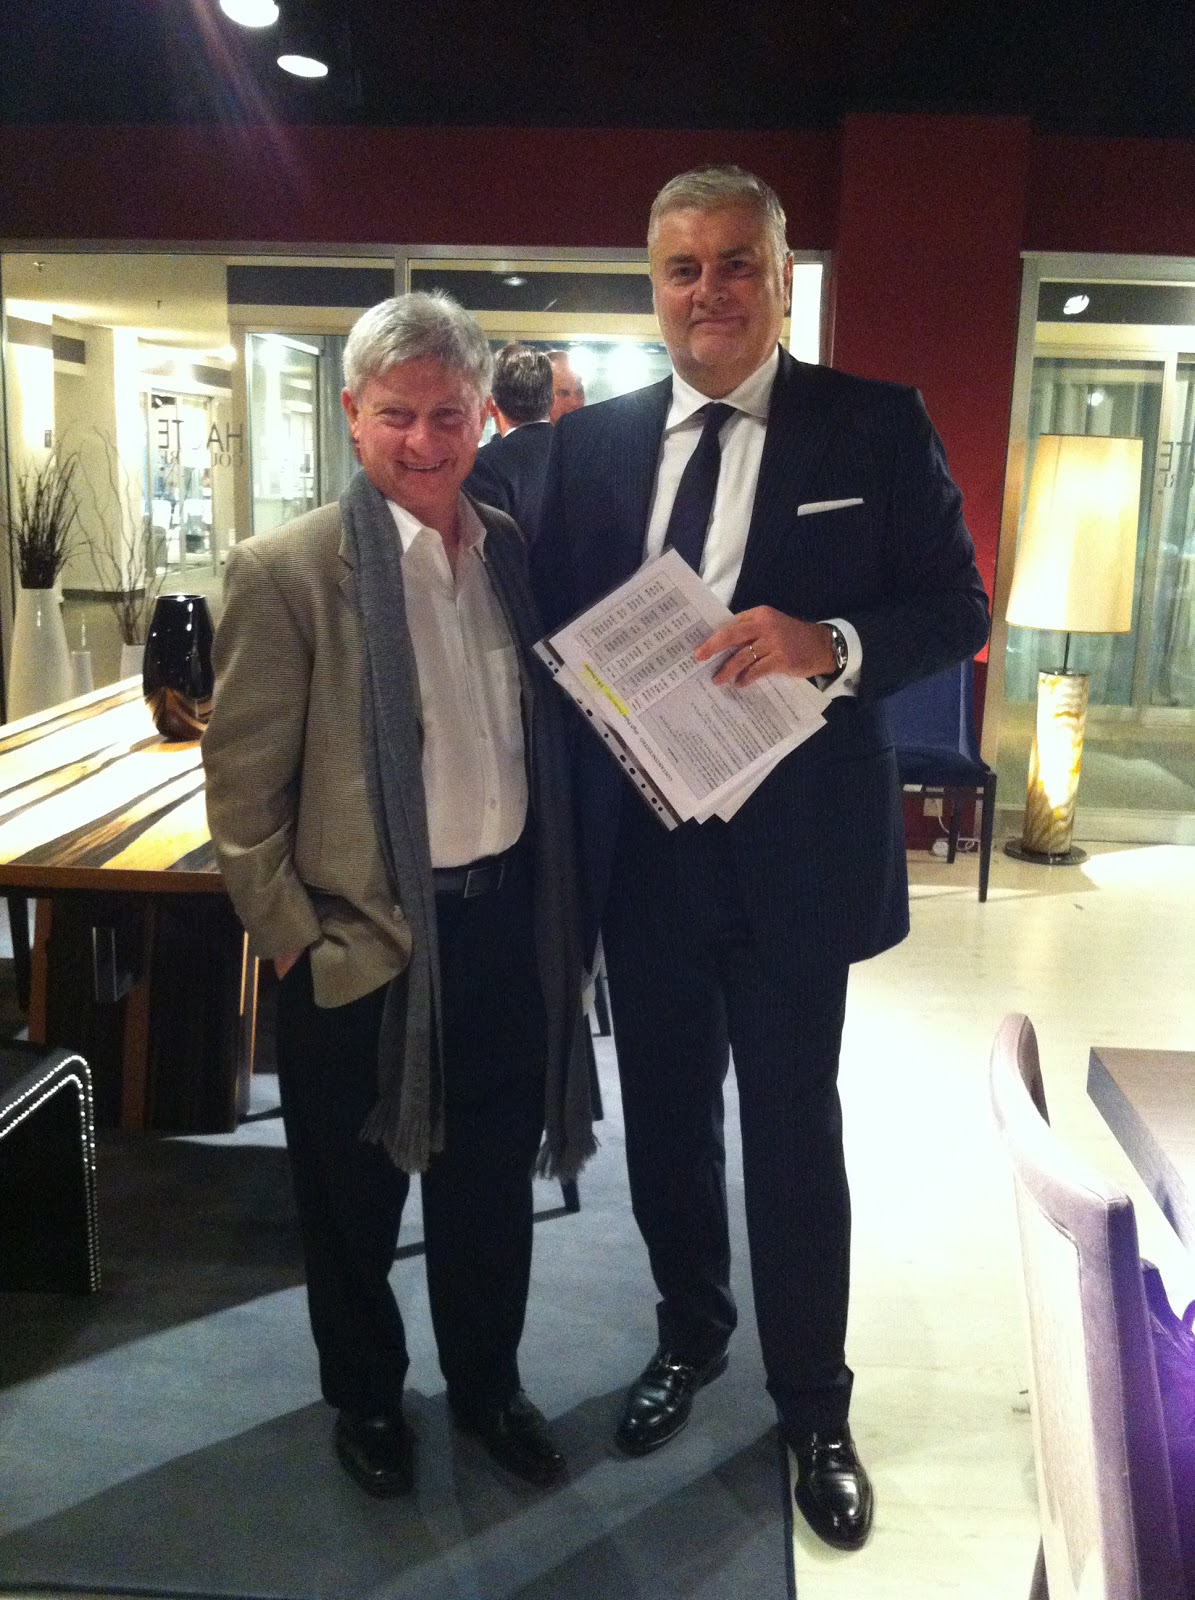 Superb Alan Wasser, CEO Of Wasseru0027s Furniture U0026 Pierpaolo Costantini Of Costantini  Pietro At Pietrou0027s Showroom